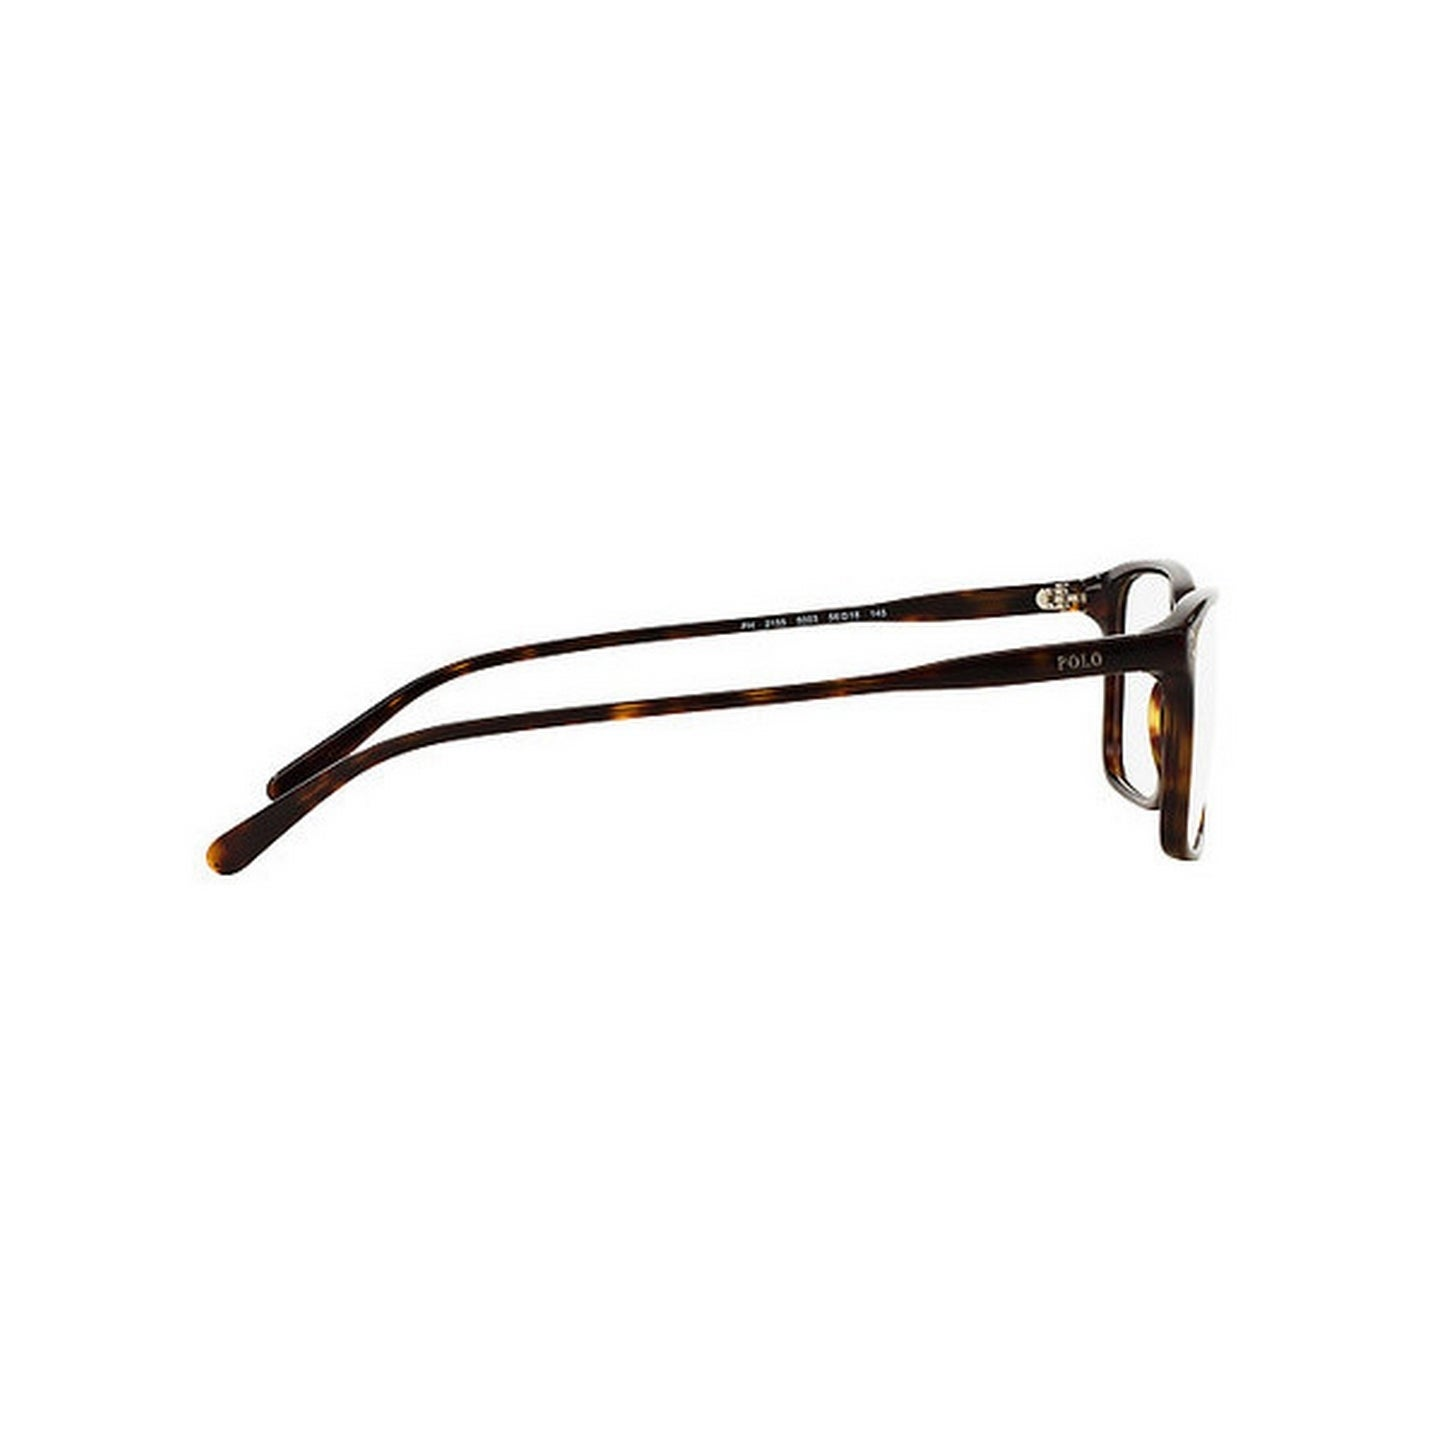 44783e033e58 Shop Polo by Ralph by Ralph Lauren Lauren Men's PH2155 5003 54 Rectangle  Plastic Havana Clear Eyeglasses - 53 mm Havana - Free Shipping Today -  Overstock - ...